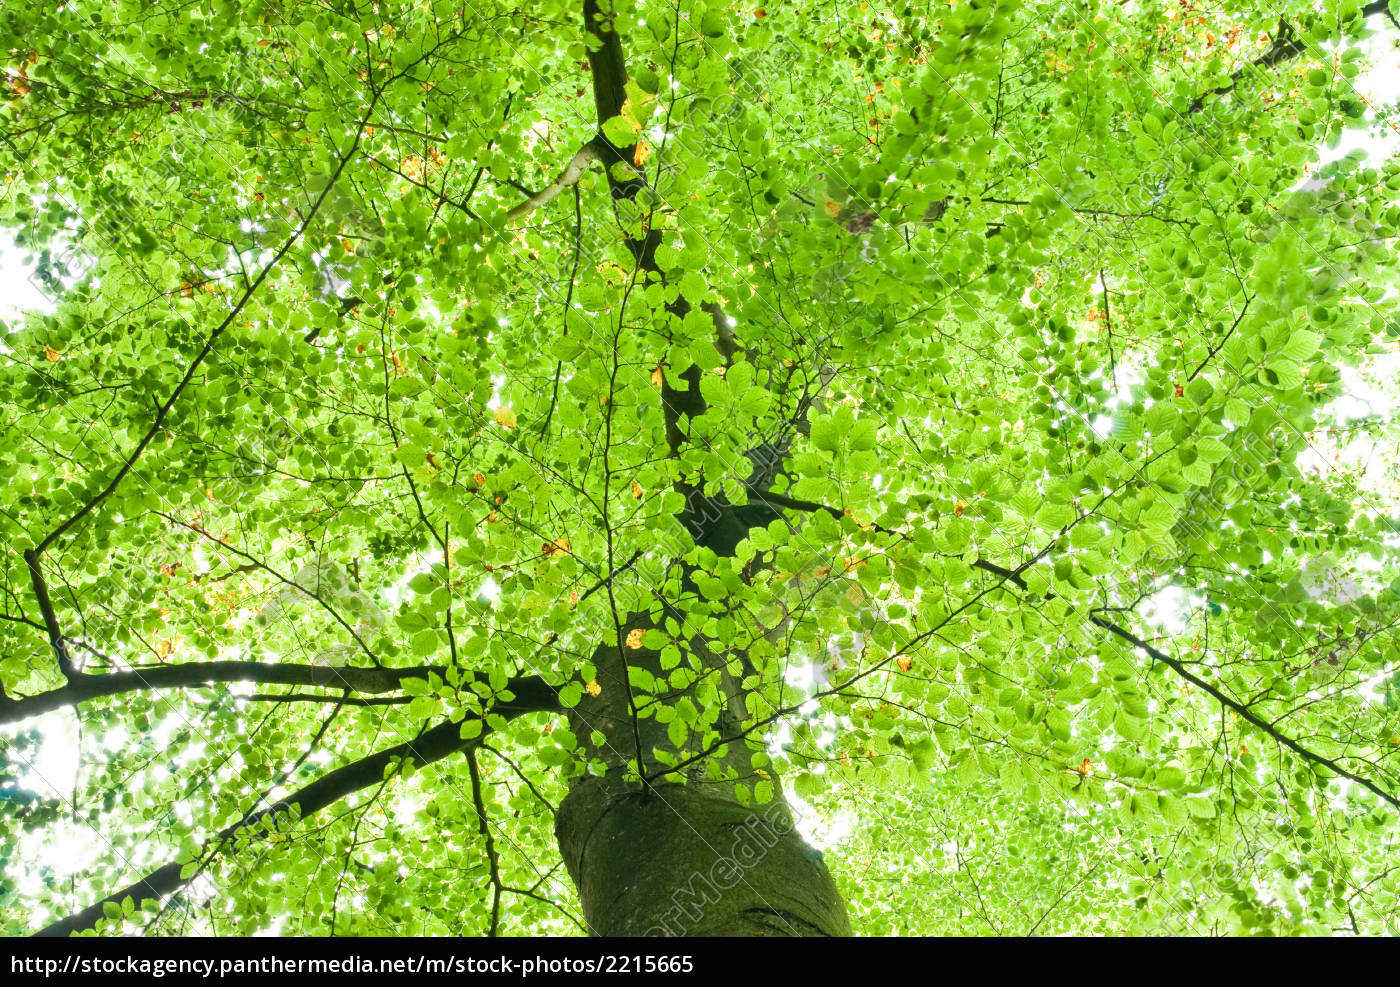 grüner baum oben - stockfoto - #2215665 - bildagentur panthermedia